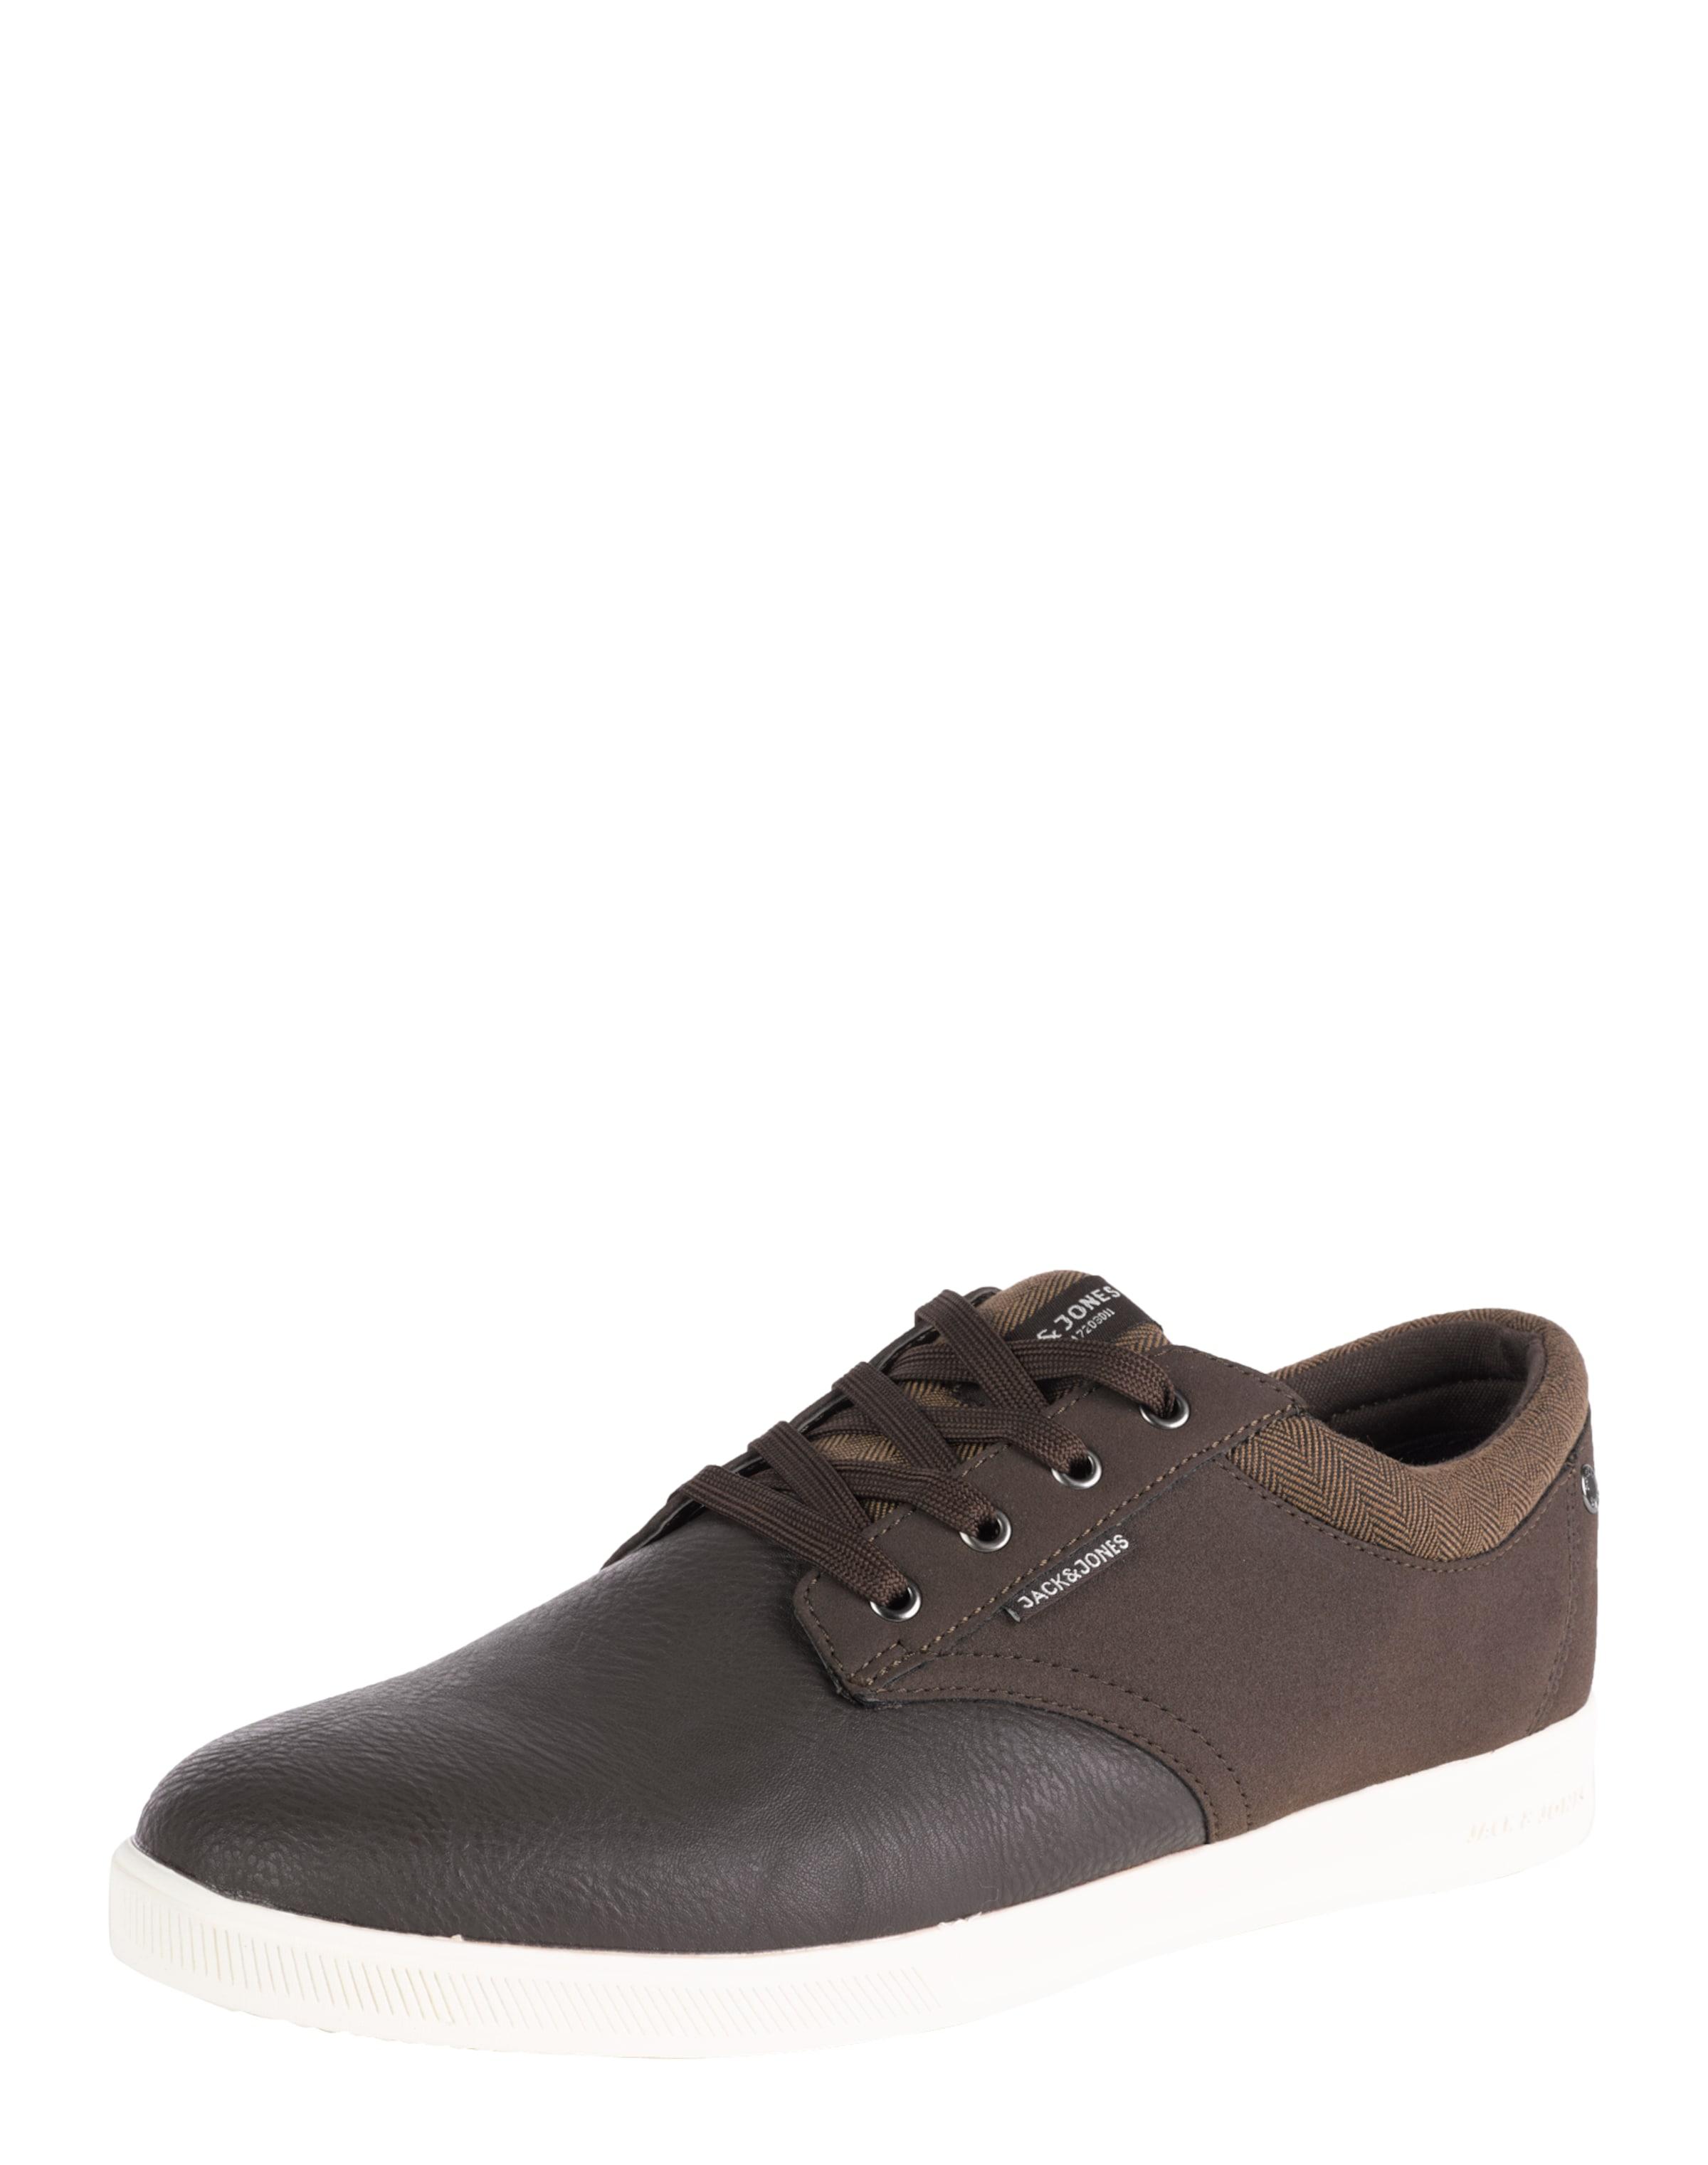 JACK & JONES Sneakers Günstige und langlebige Schuhe